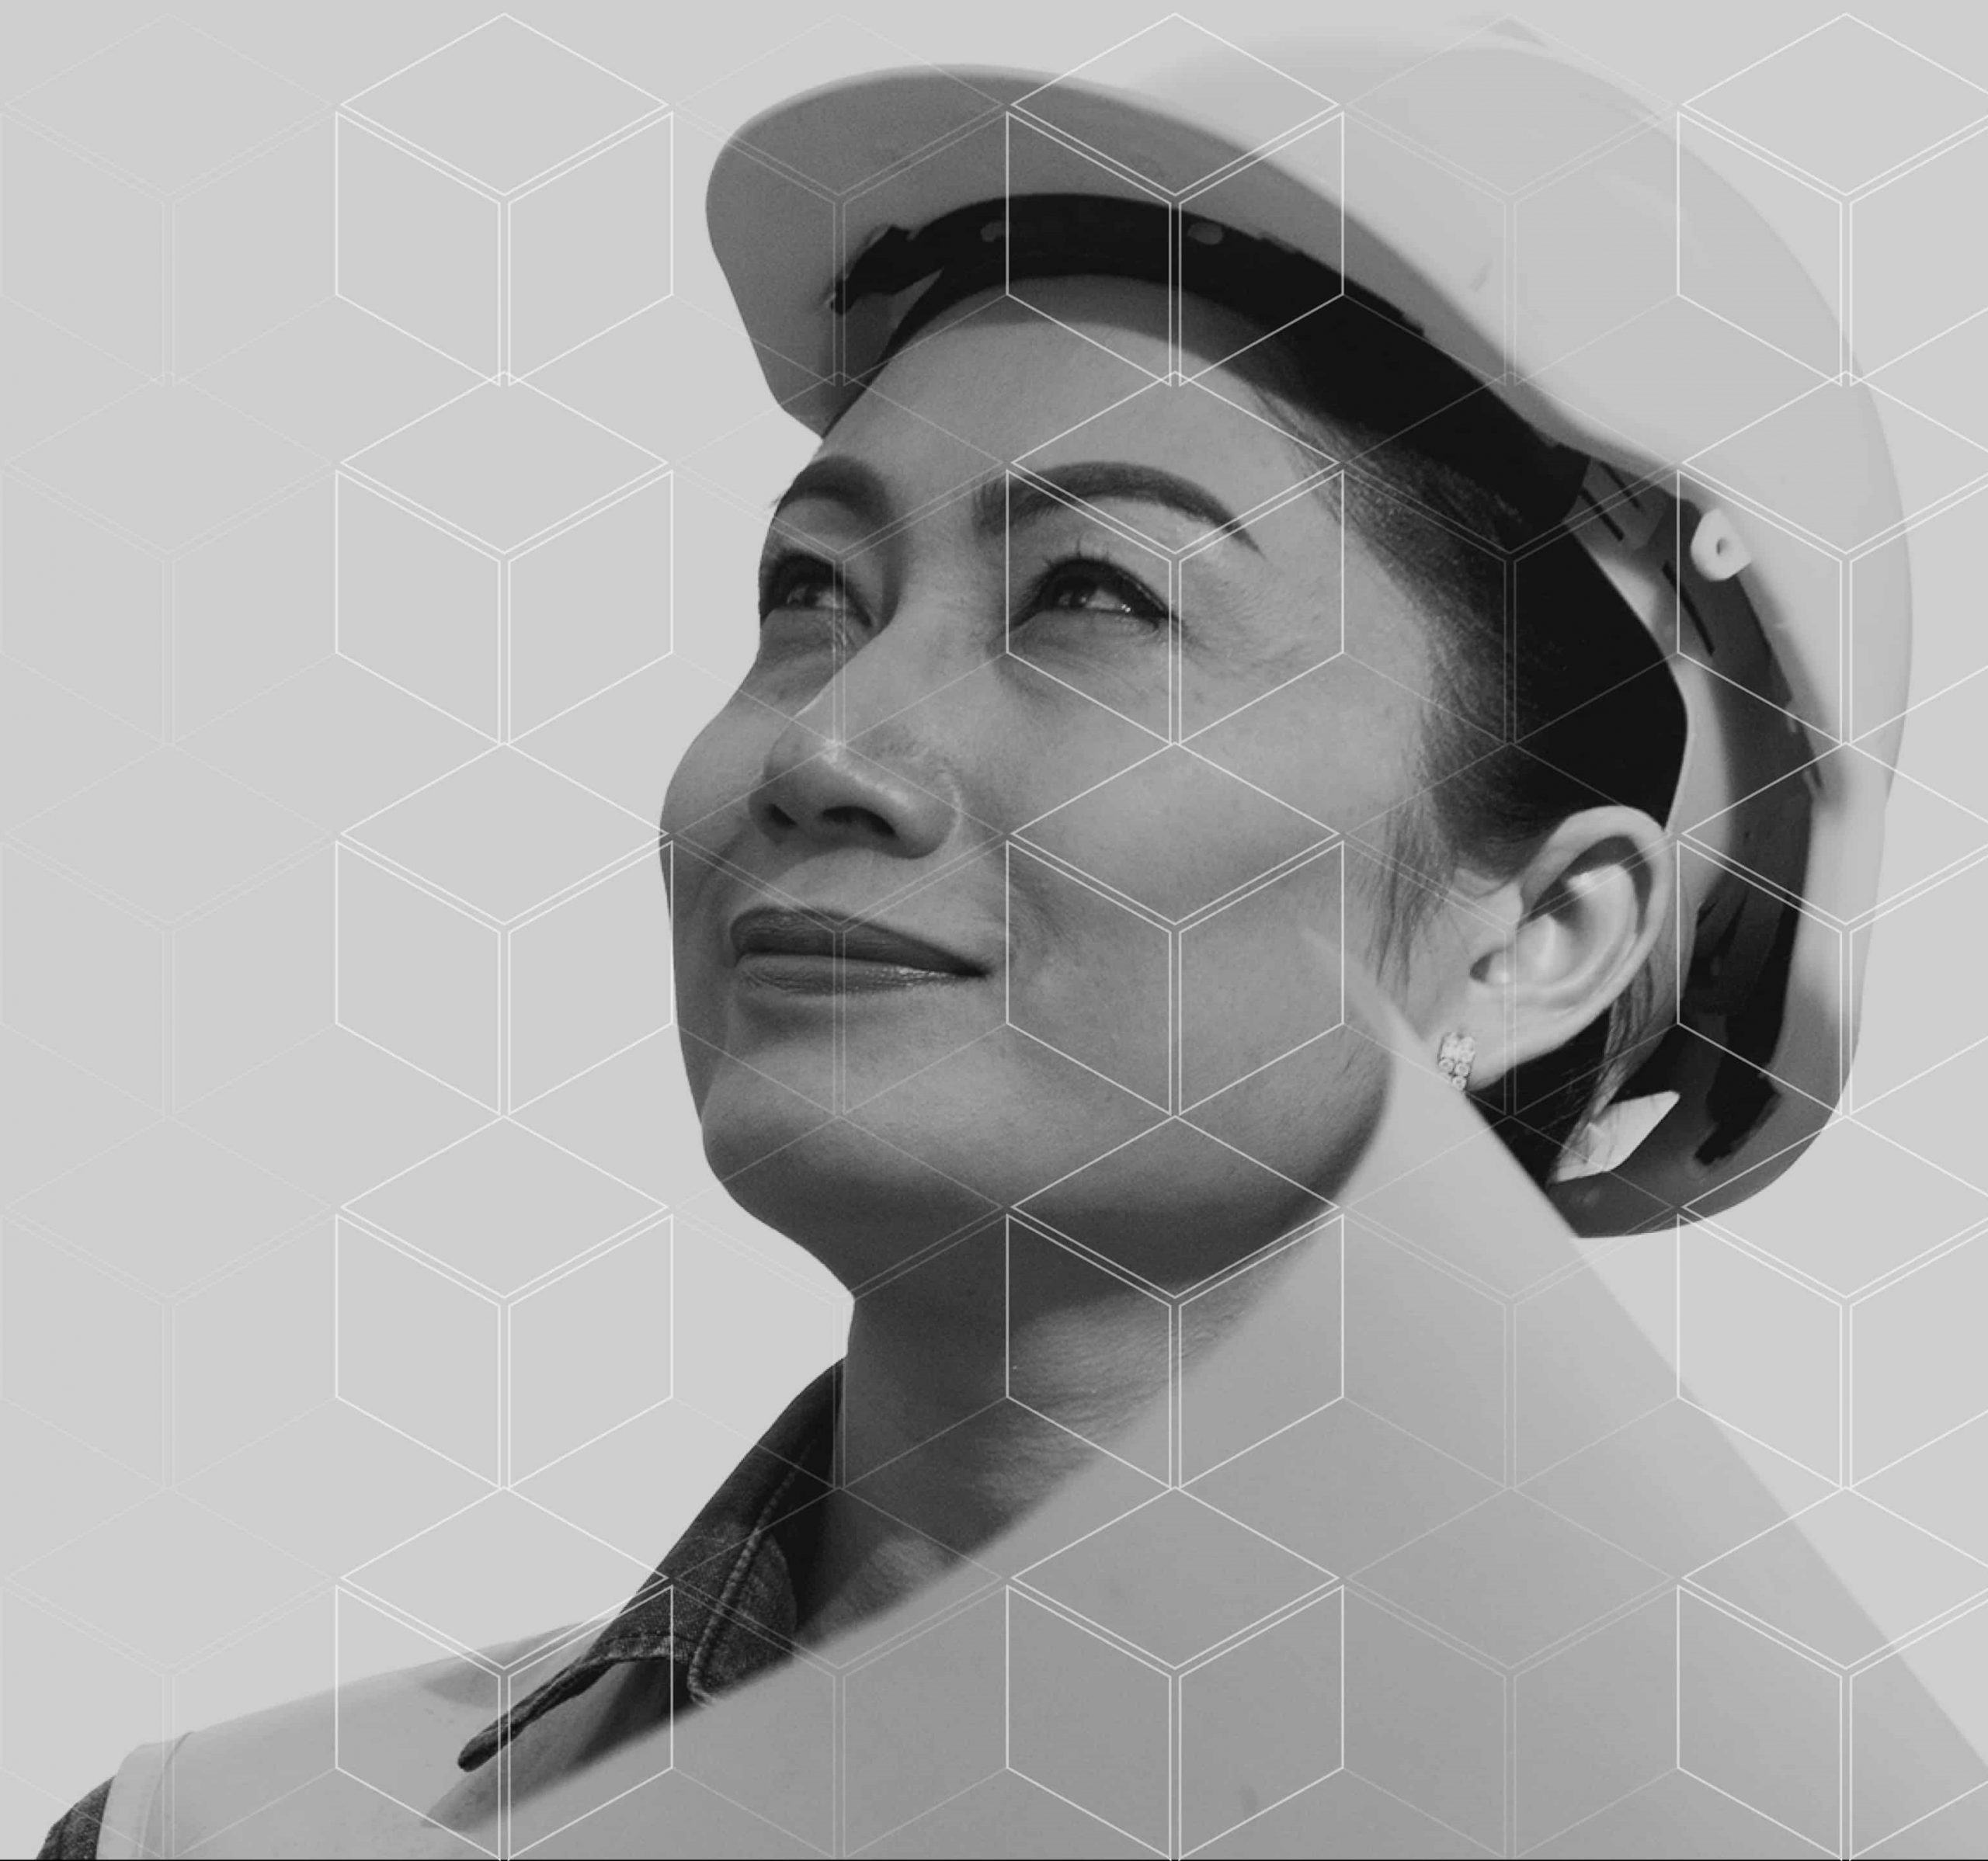 mulher de capacete